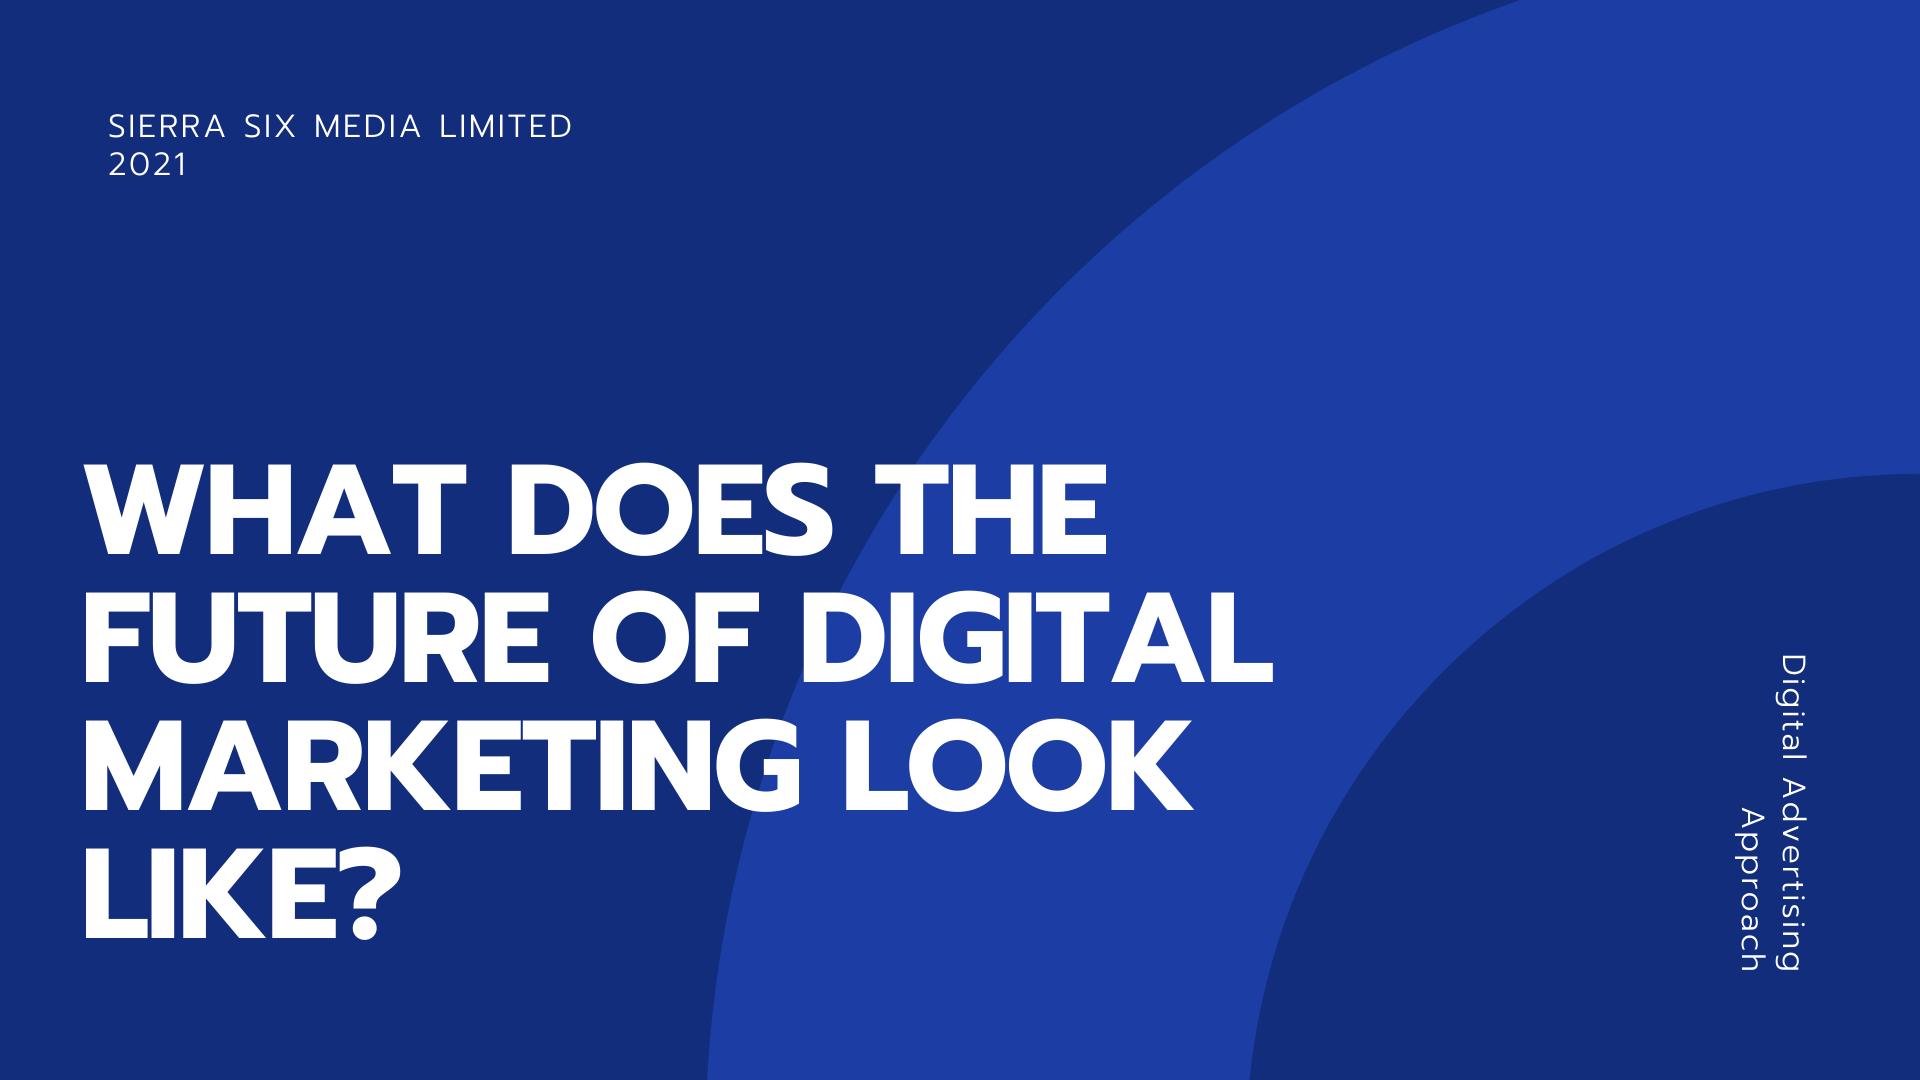 Sierra Six Media, Digital marketing agency whitepaper: the future of digital marketing